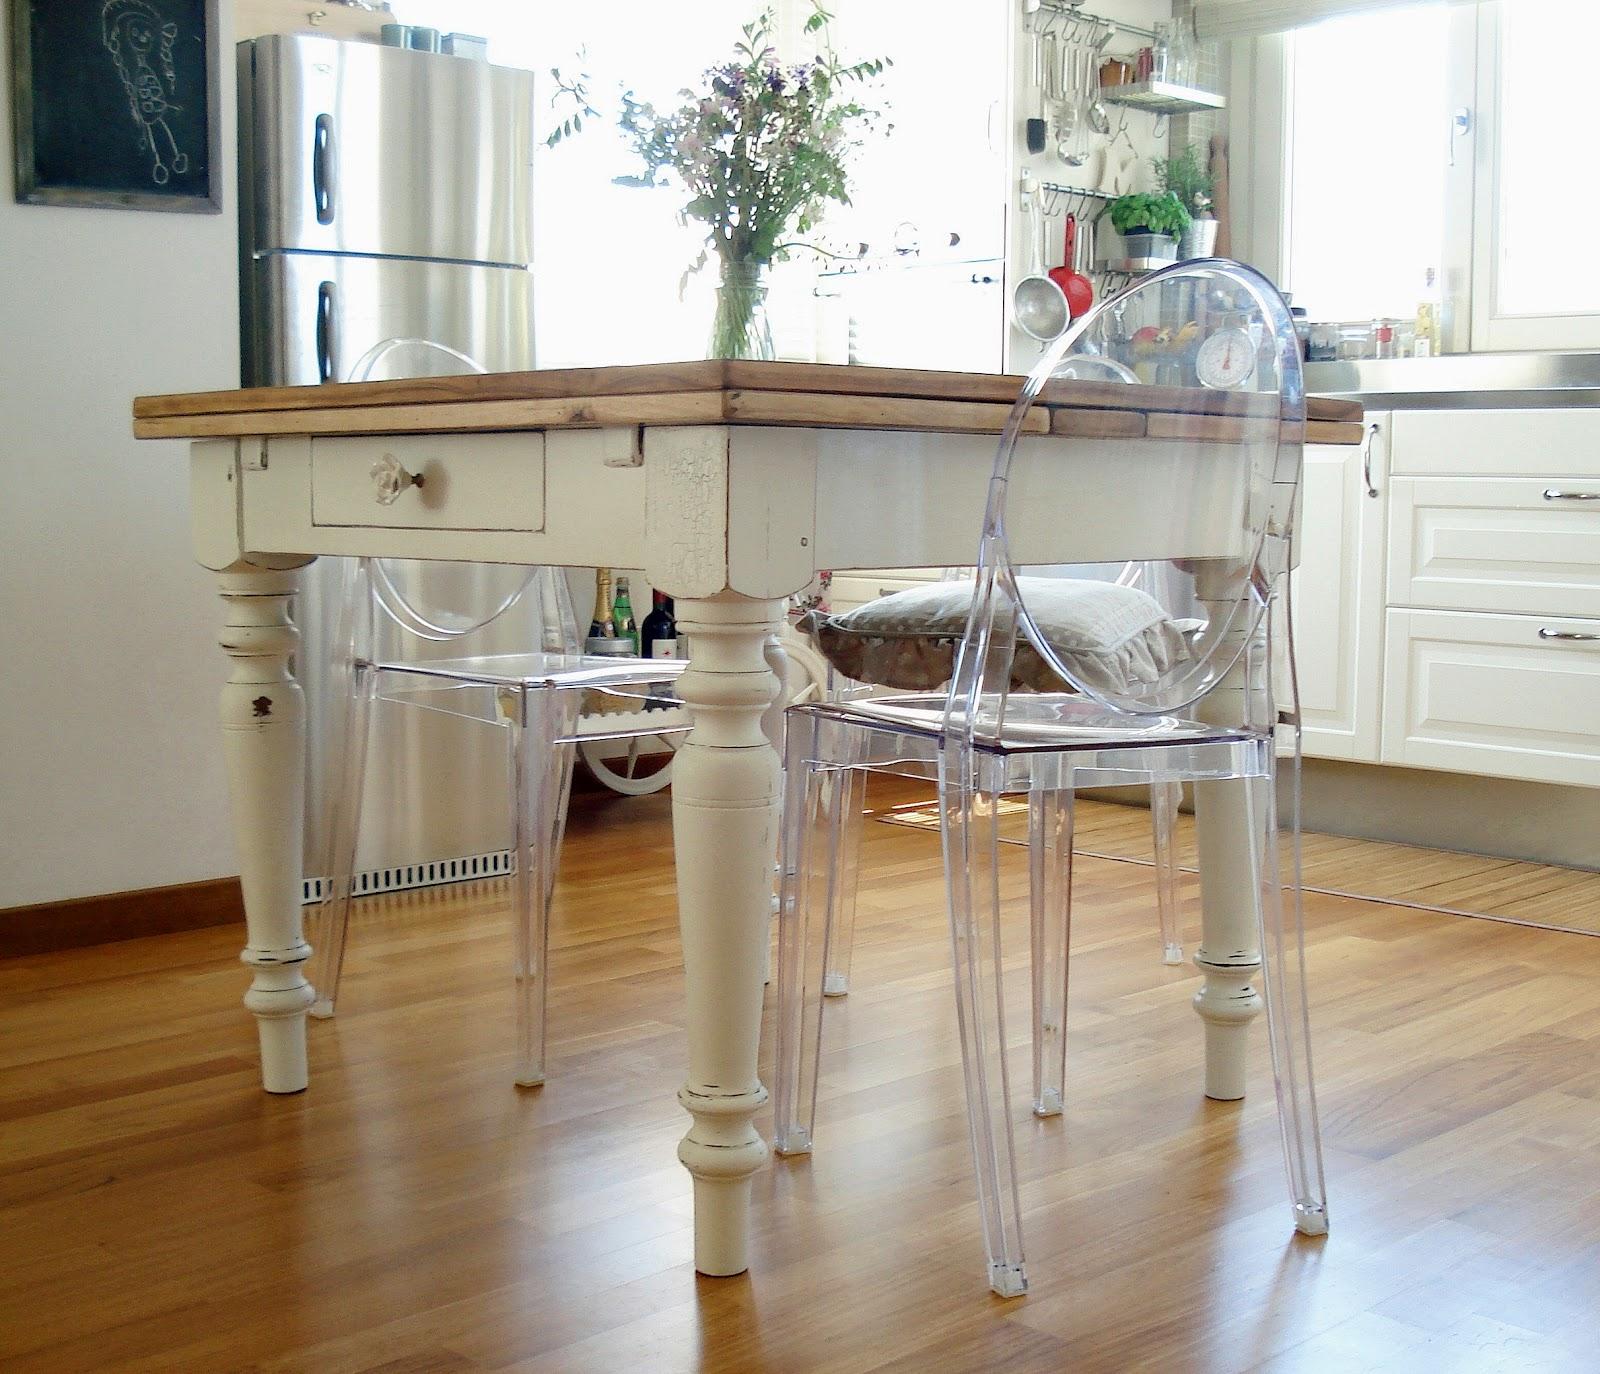 Beautiful Tavoli Da Cucina Usati Images - bakeroffroad.us ...